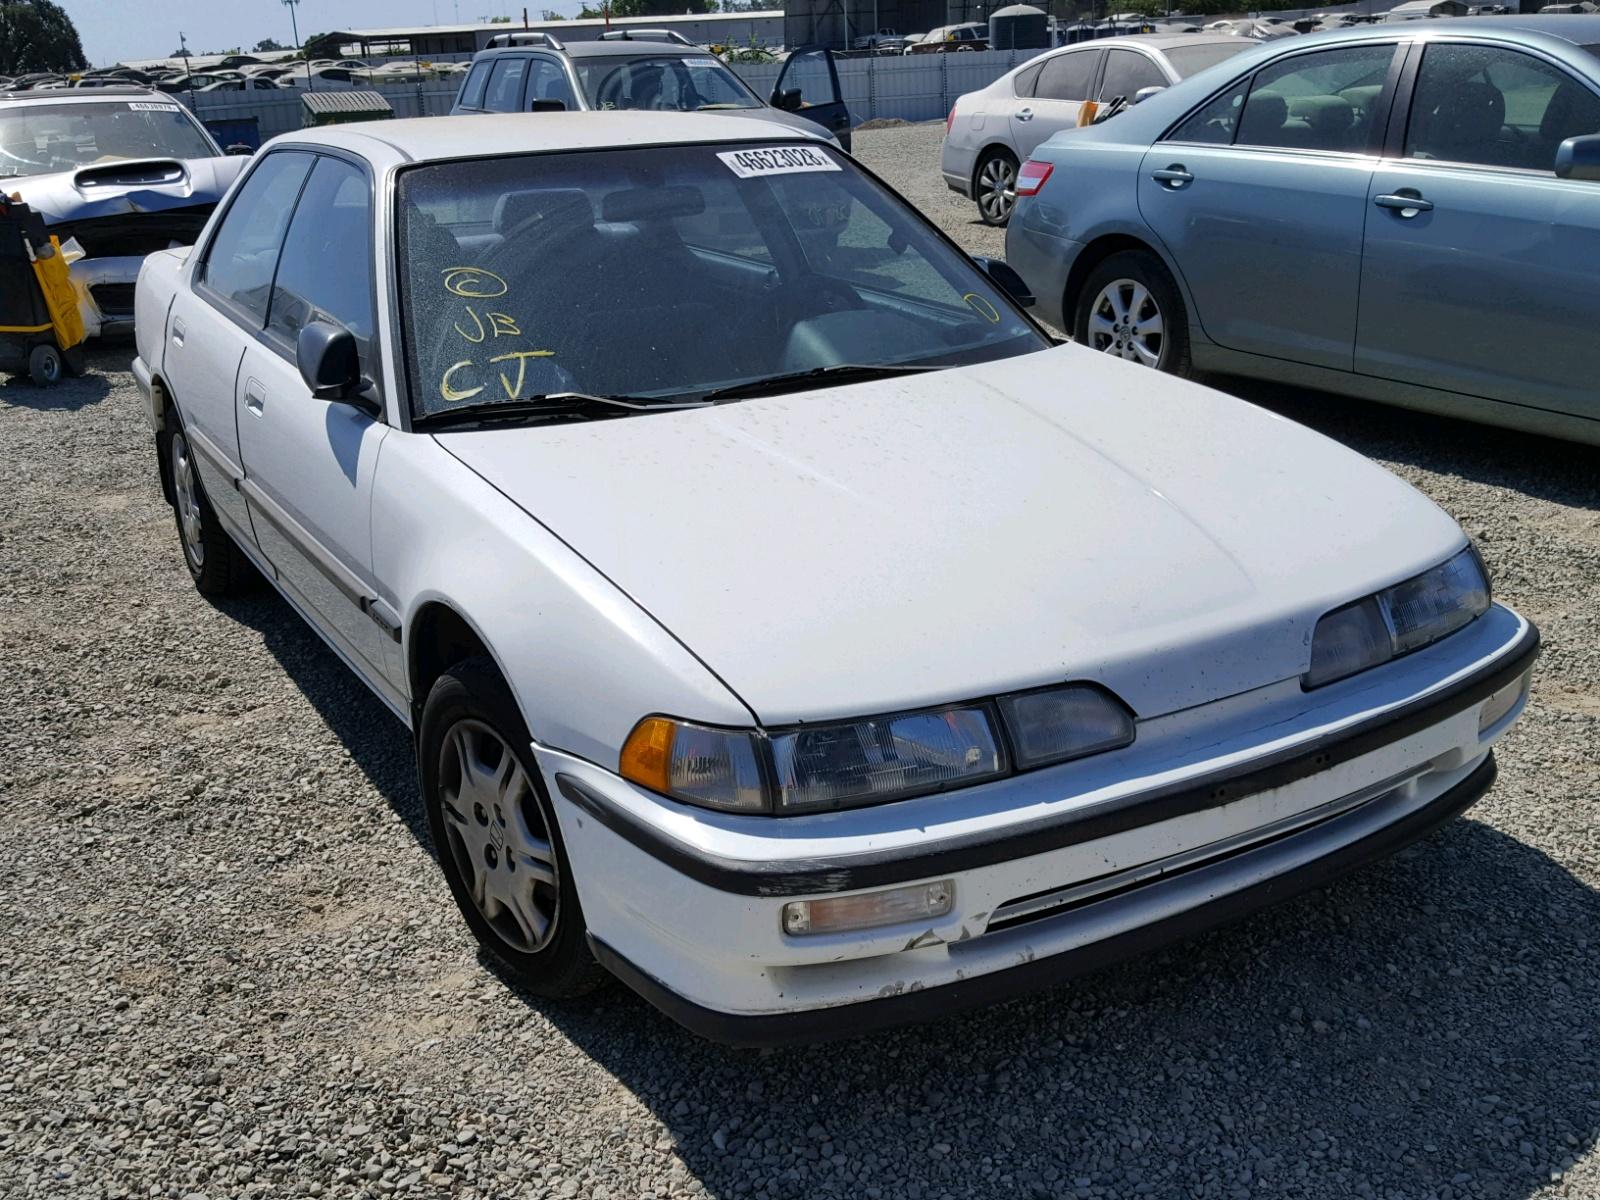 Acura Integra LS For Sale At Copart Antelope CA Lot - 1990 acura integra rims